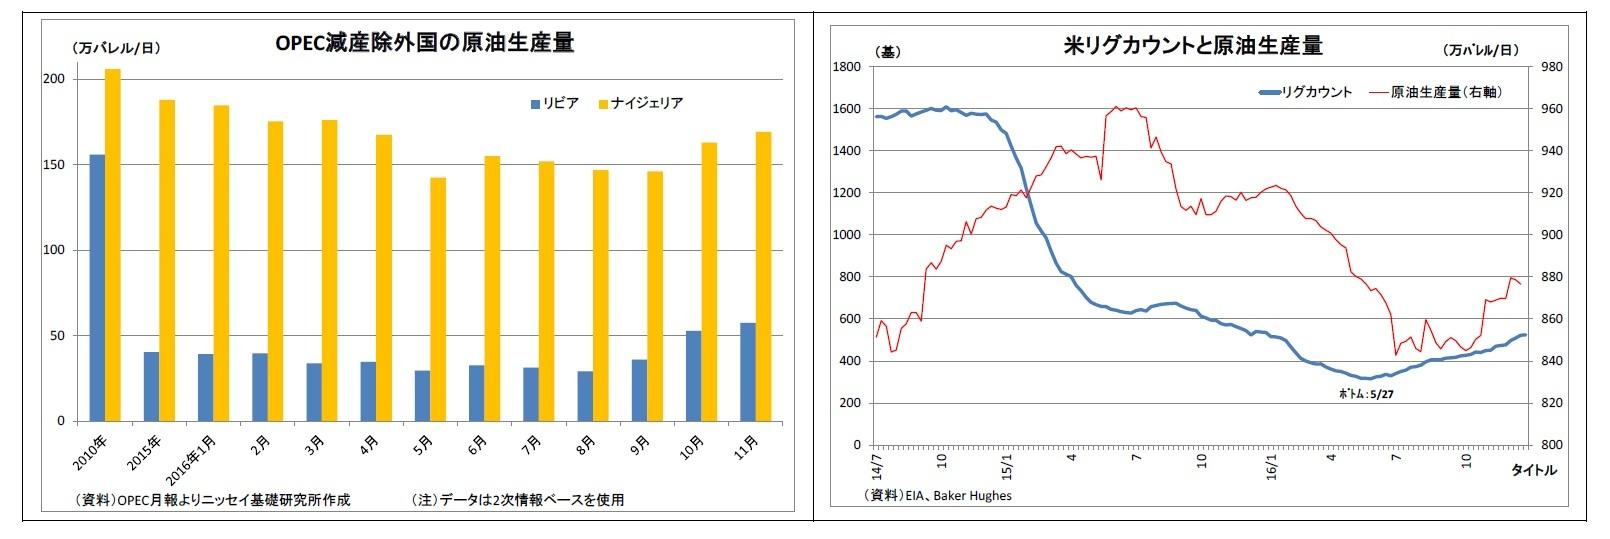 OPEC減産除外国の原油生産量/米リグカウントと原油生産量